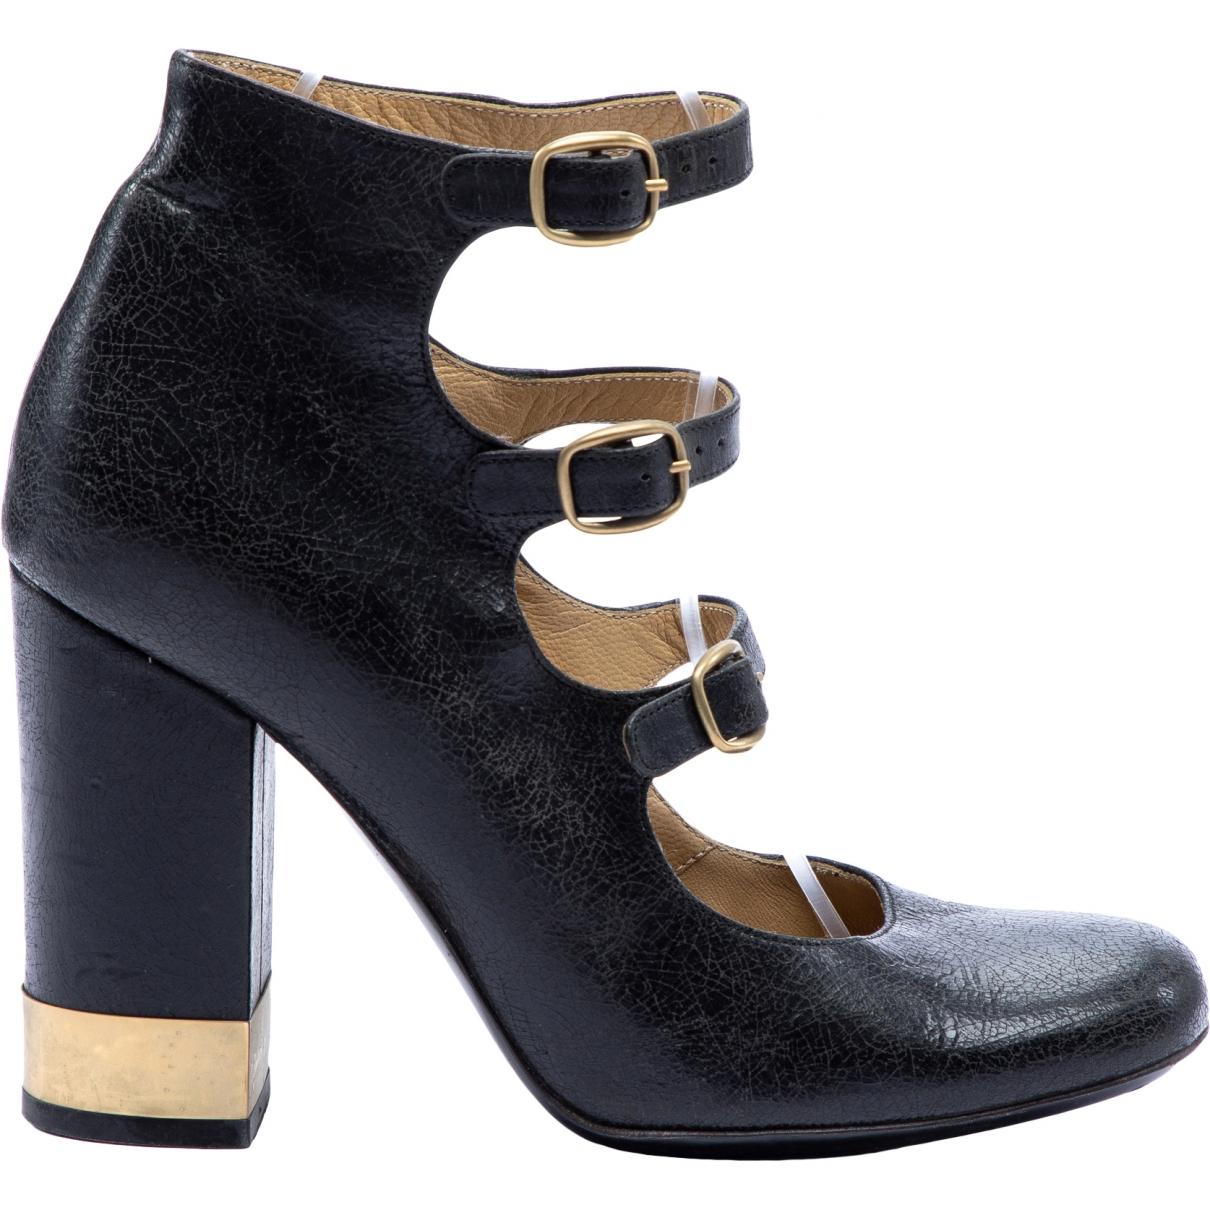 Chloé \N Black Leather Heels for Women 36 EU